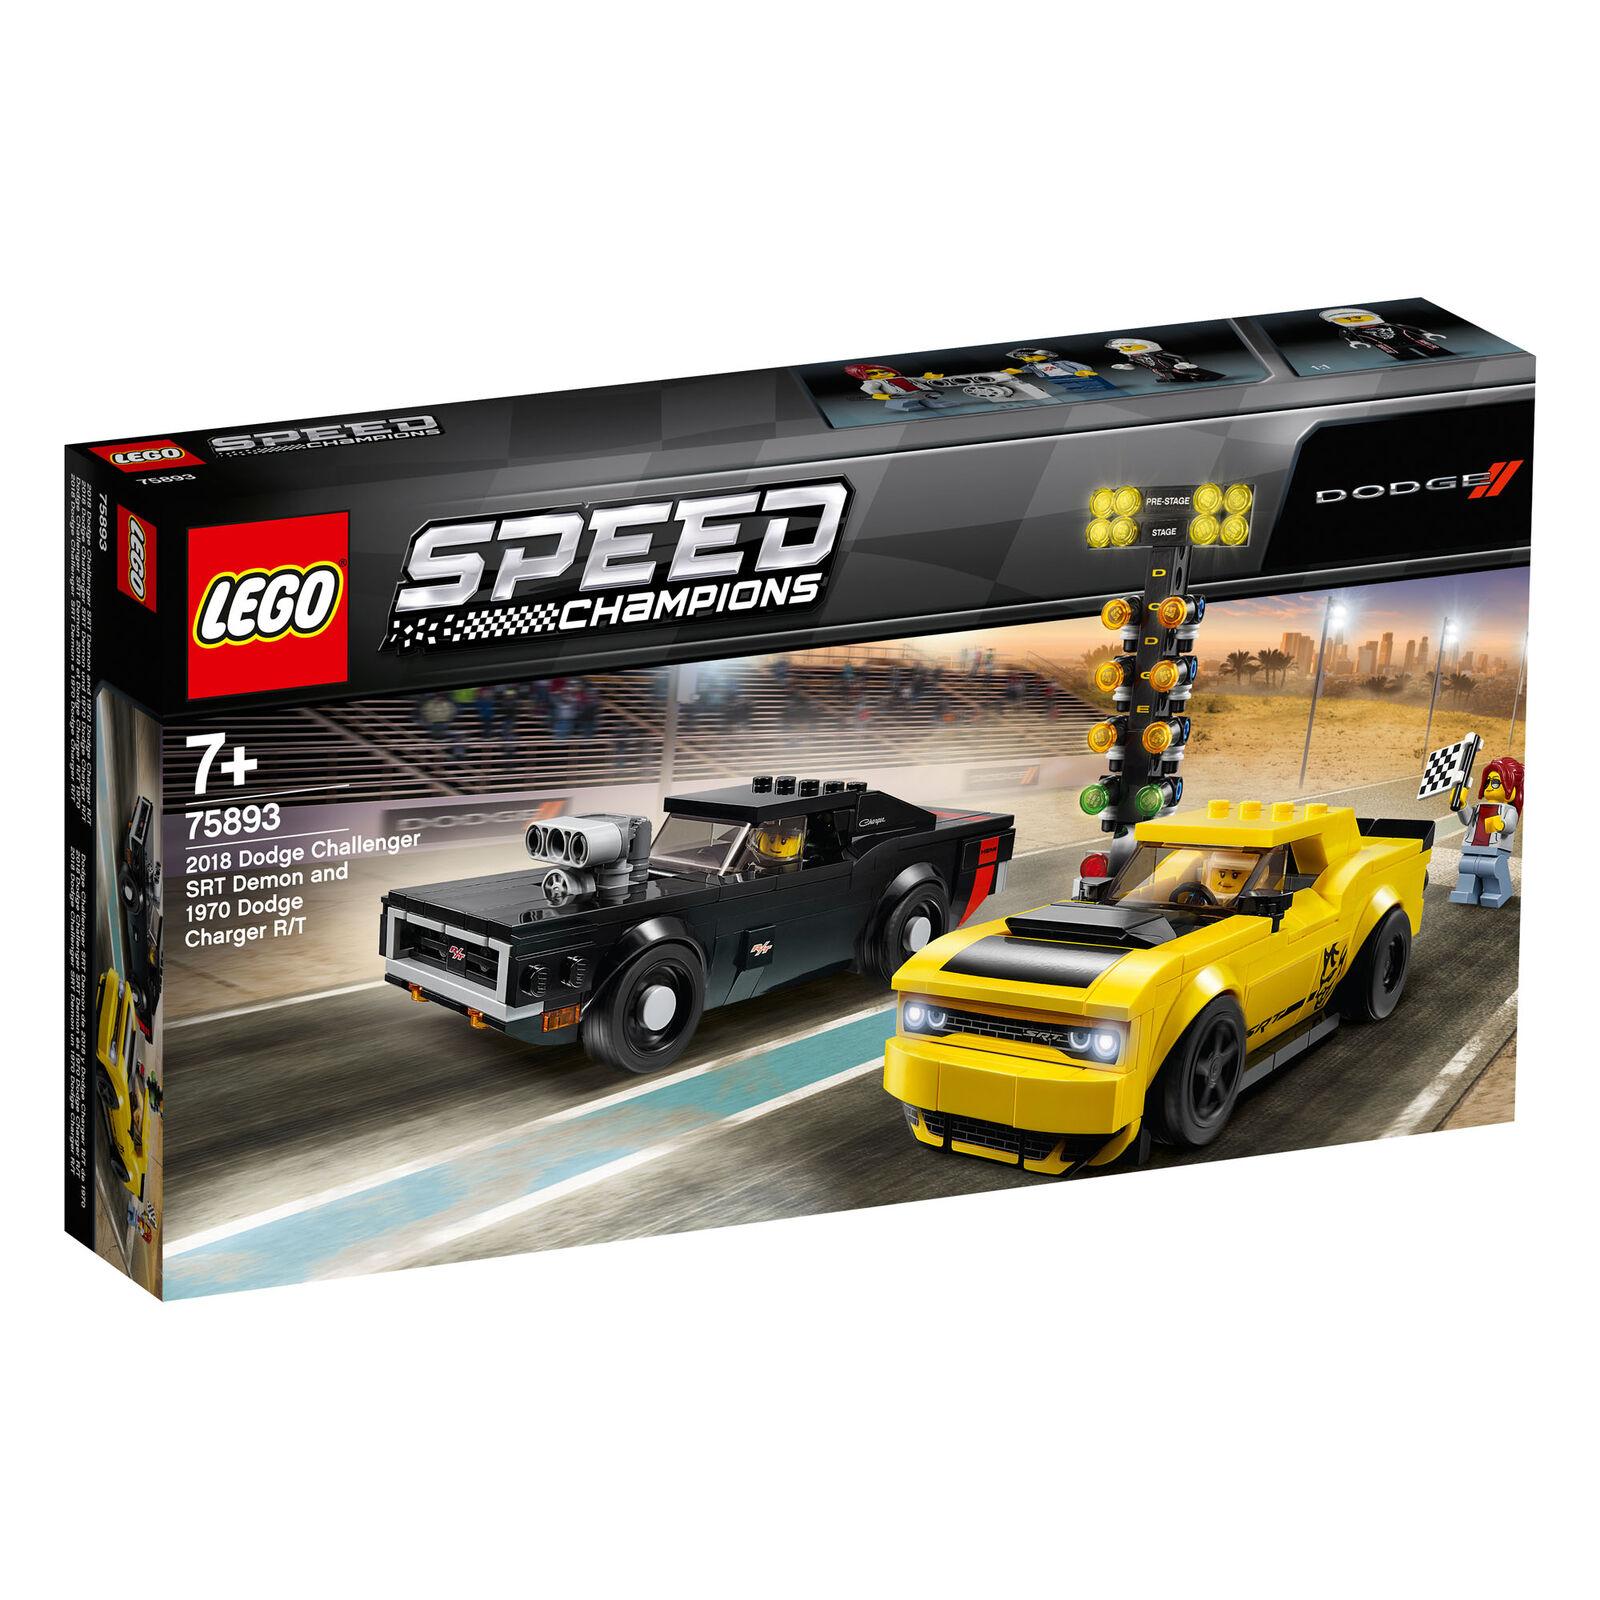 75893 LEGO Speed Speed Speed Champions 2018 Dodge Challenger SRT Demon & 1970 Dodge Charger 0bb381